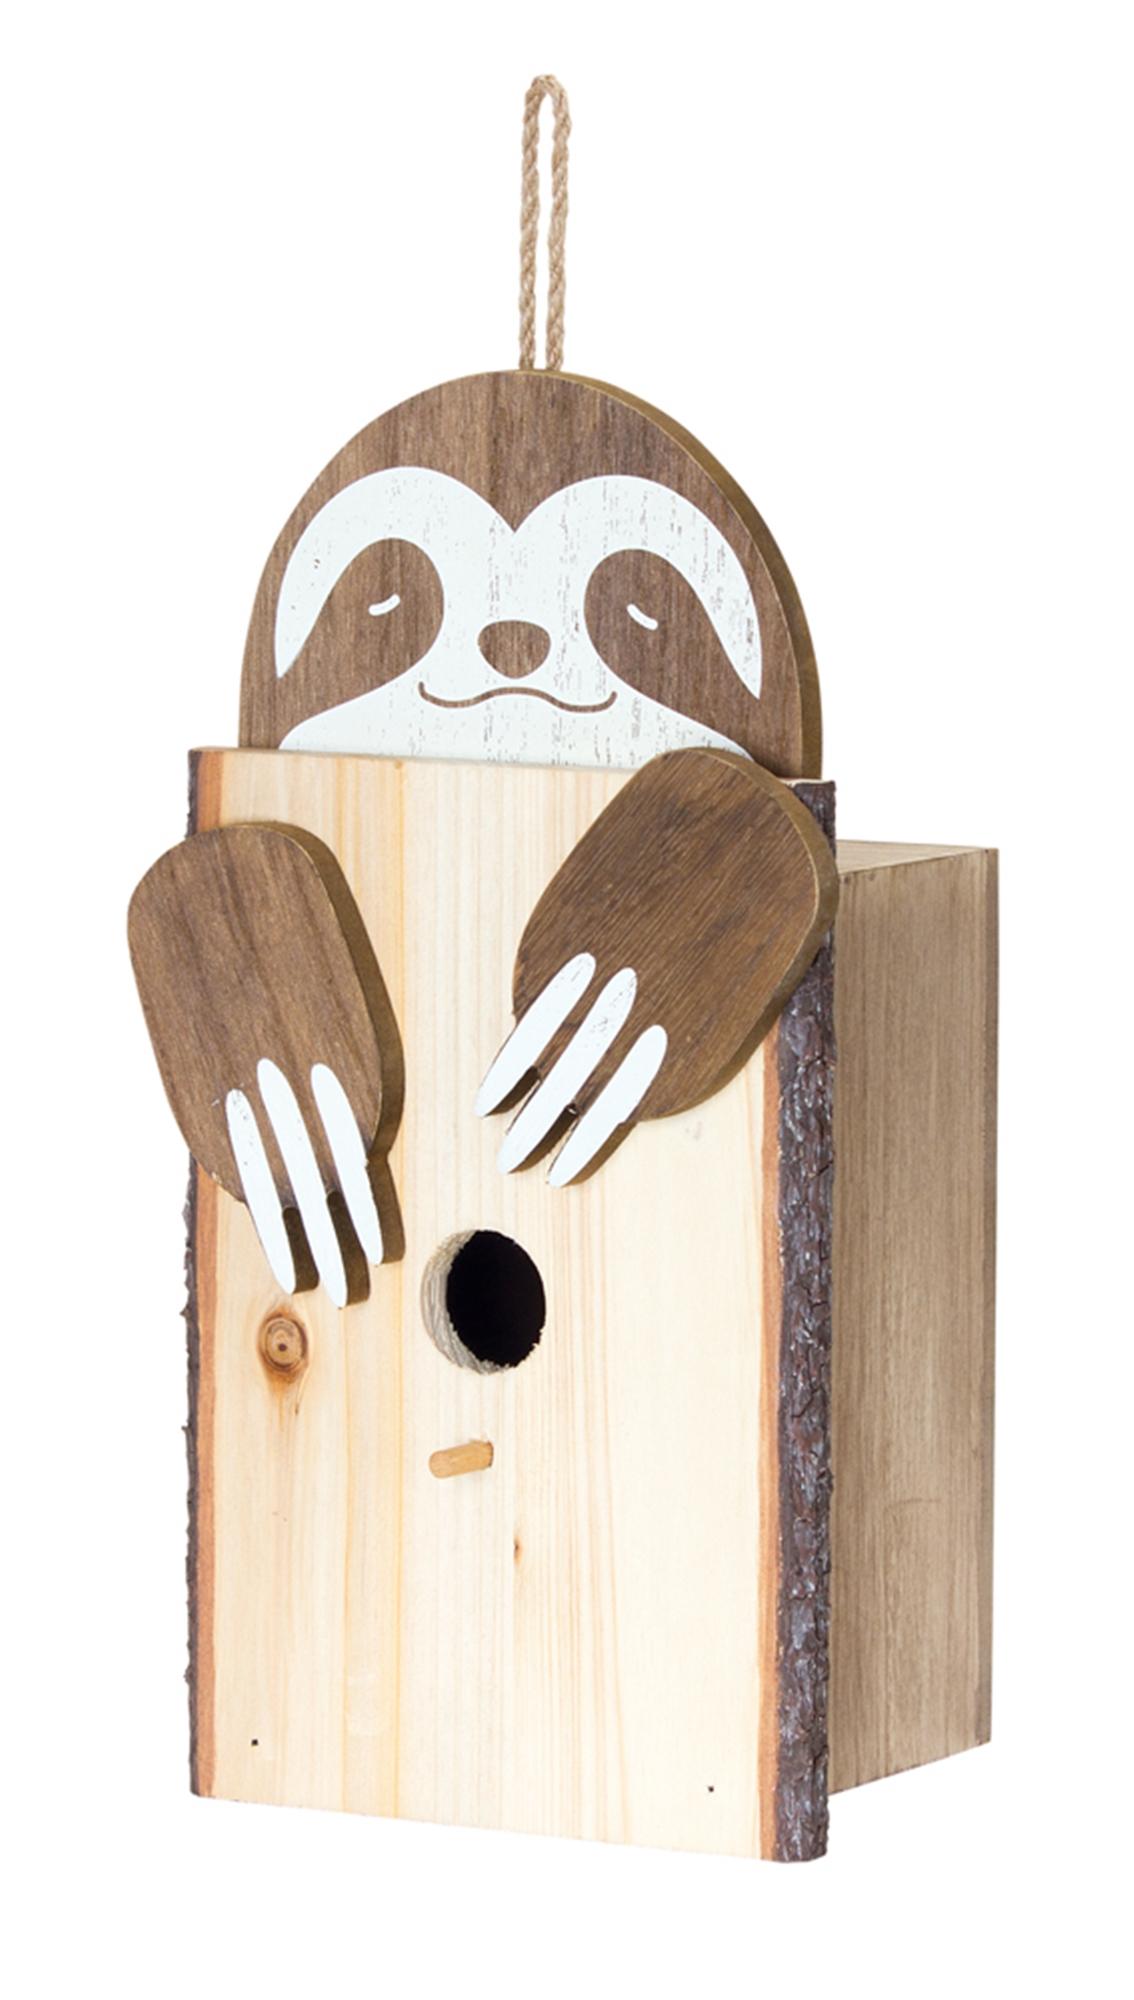 "Sloth Birdhouse (Set of 2) 6.25"" x 12""H MDF/Wood"